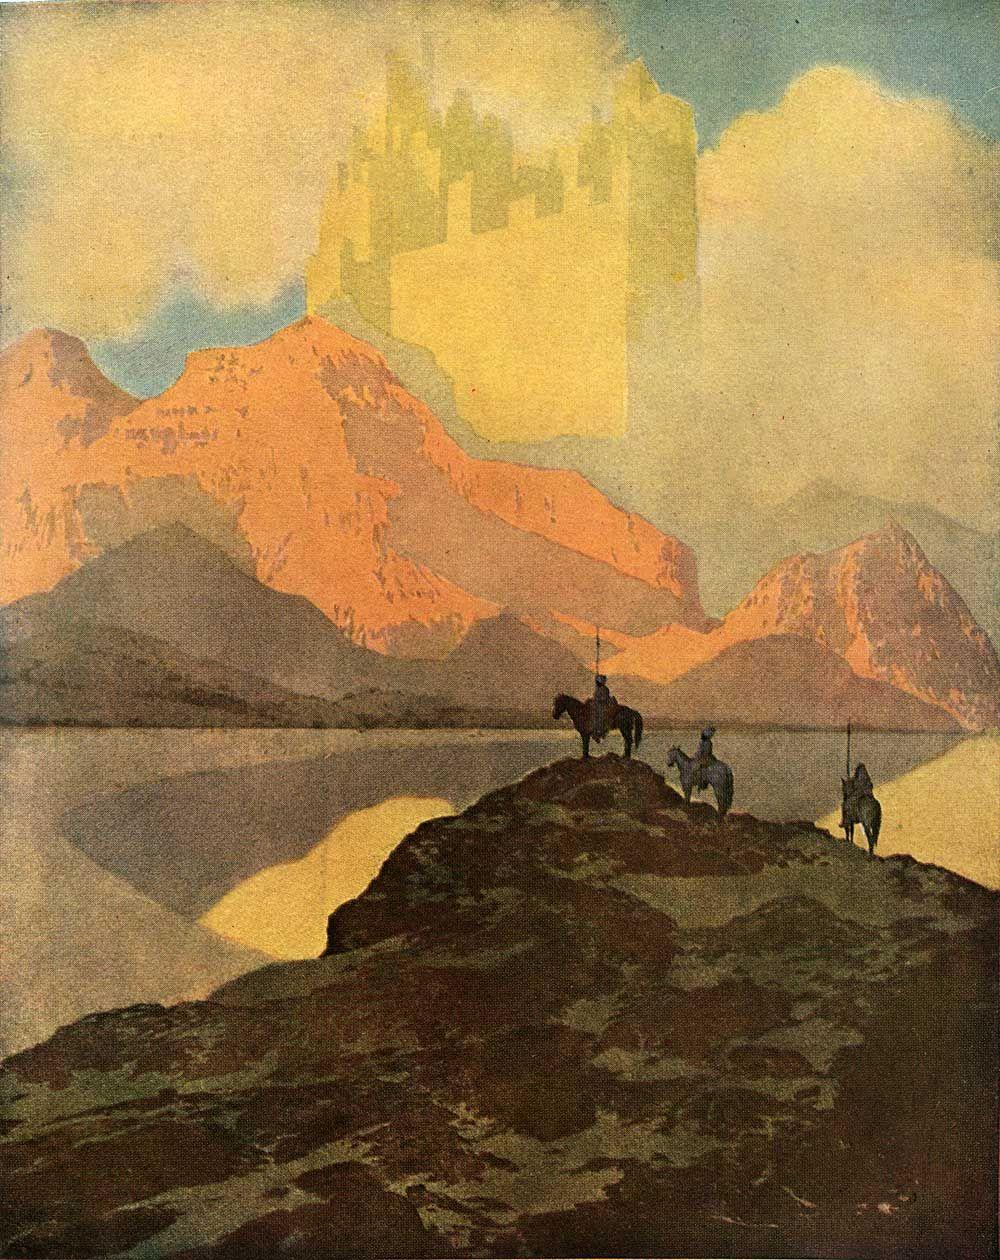 Illus Maxfield Parrish The Arabian Nights 1909 Fairytale Art